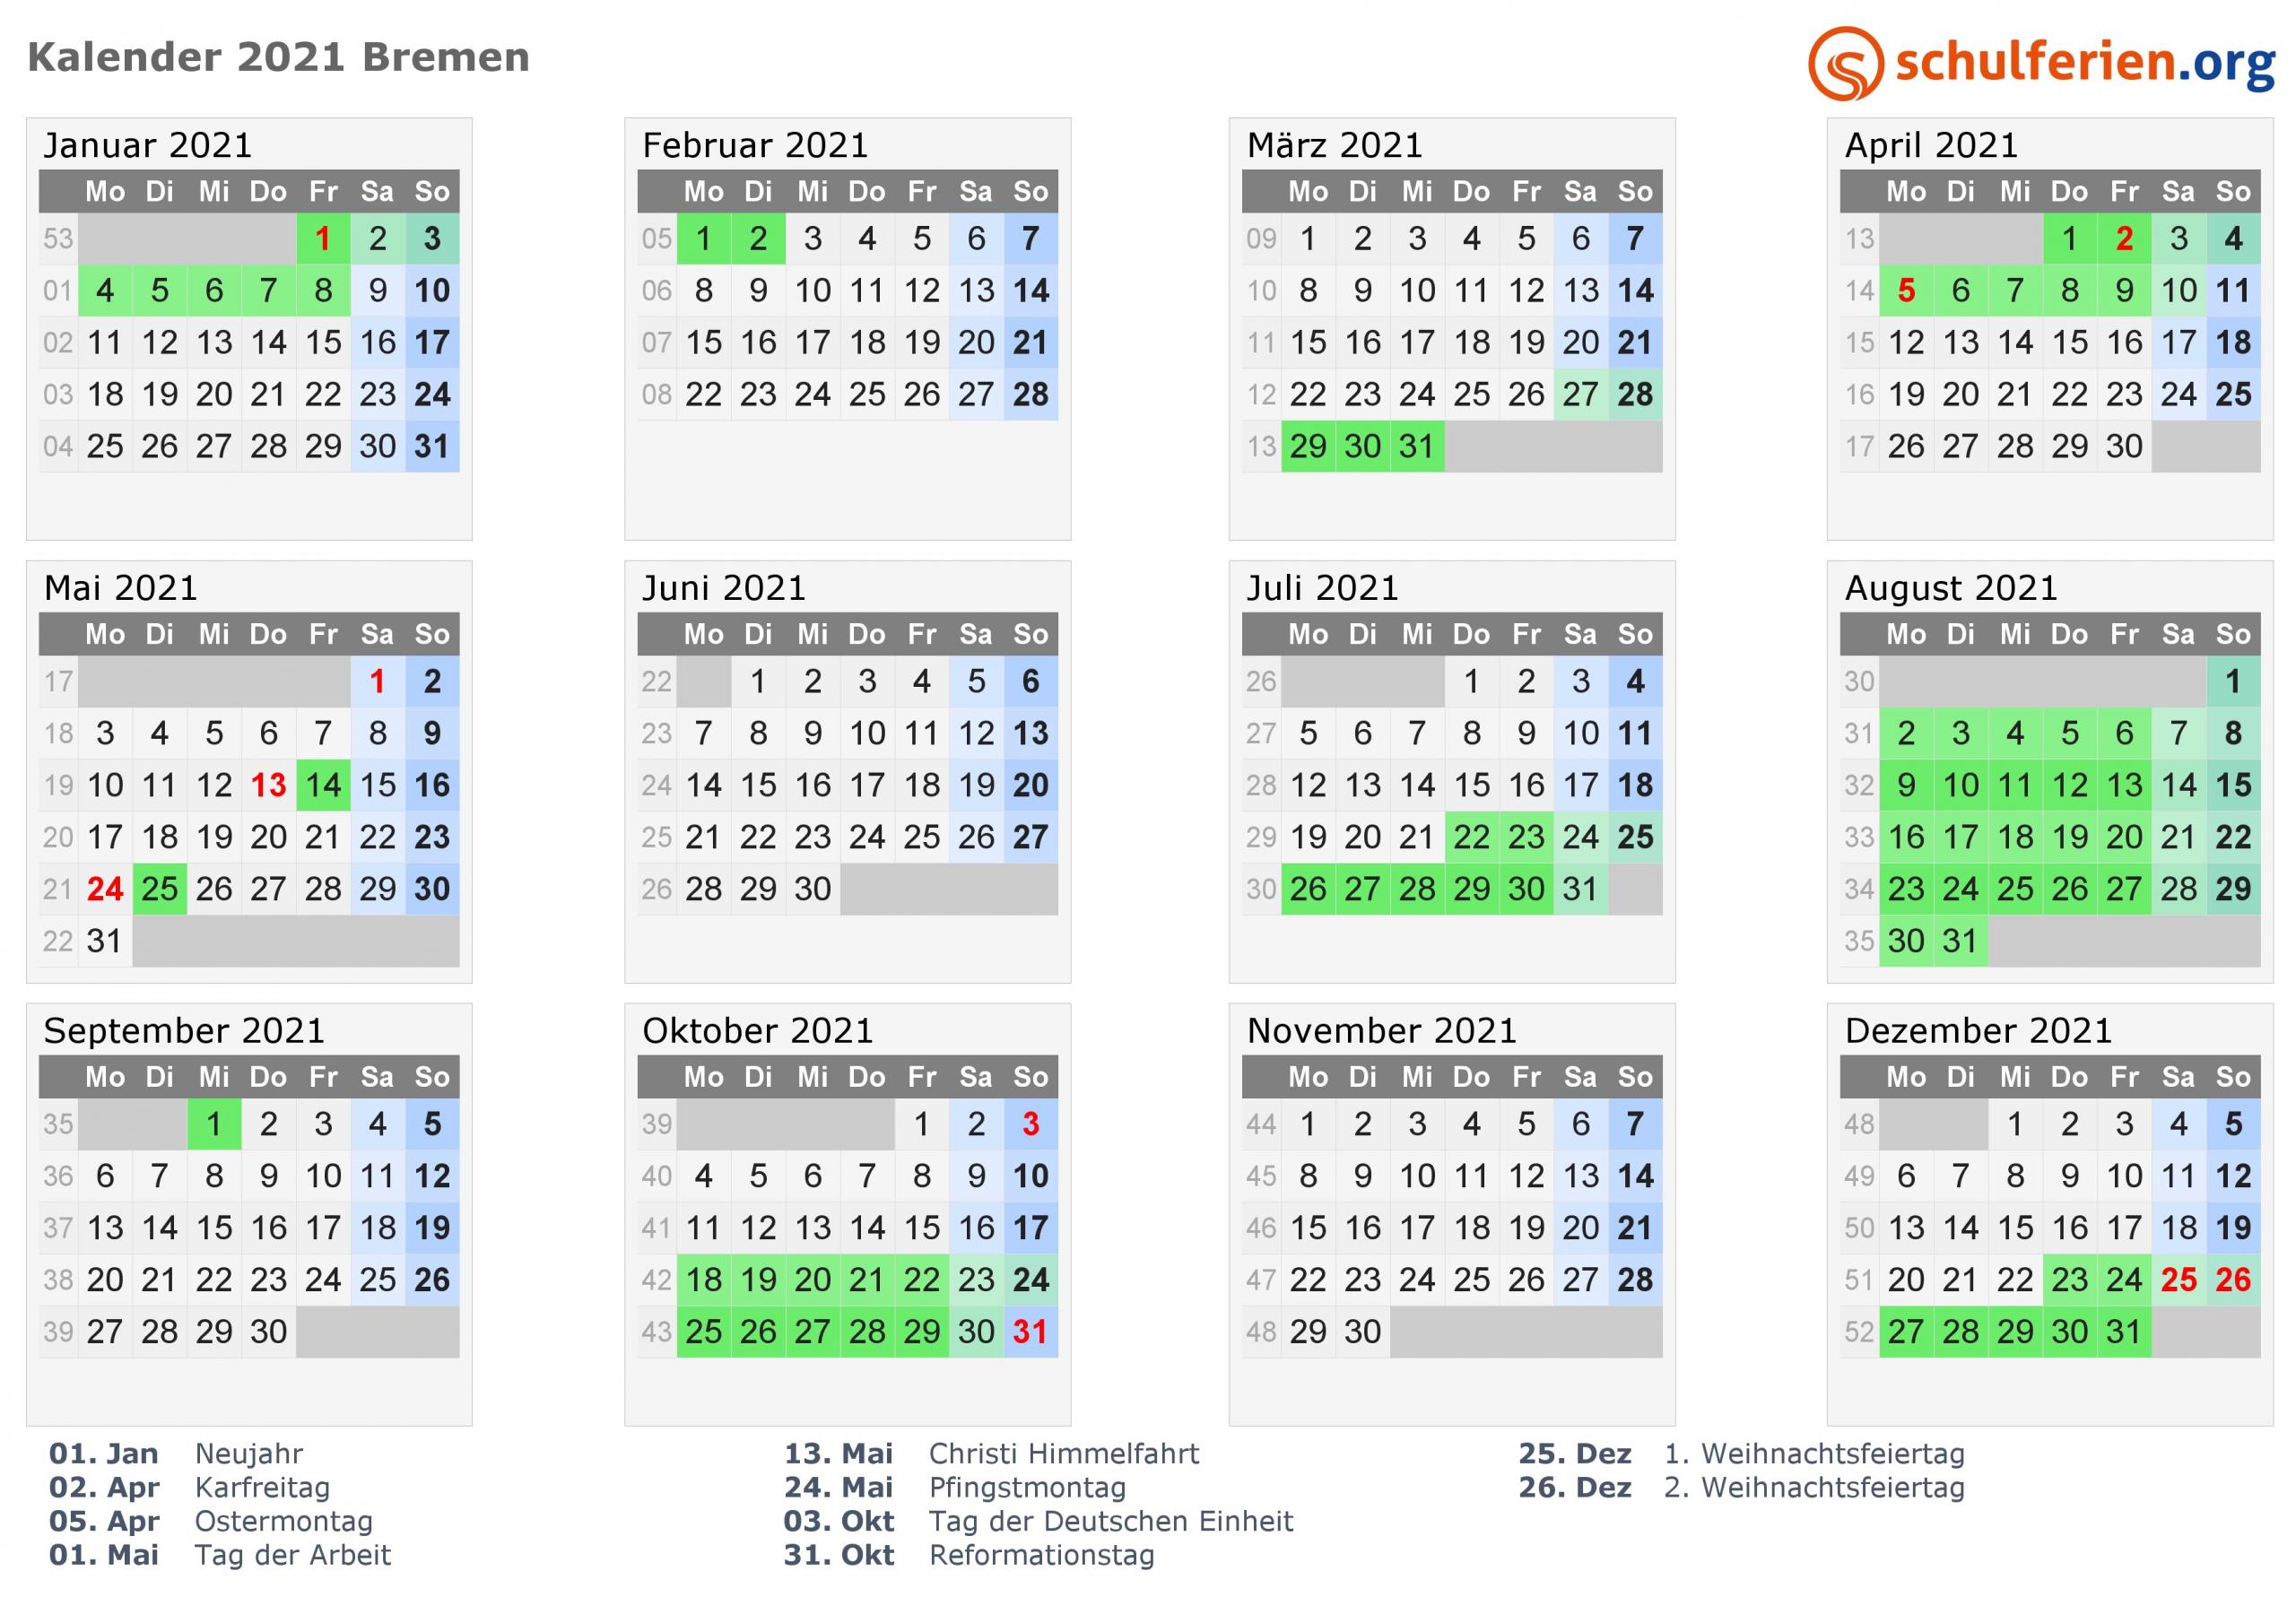 kalender 2021 bremen quer